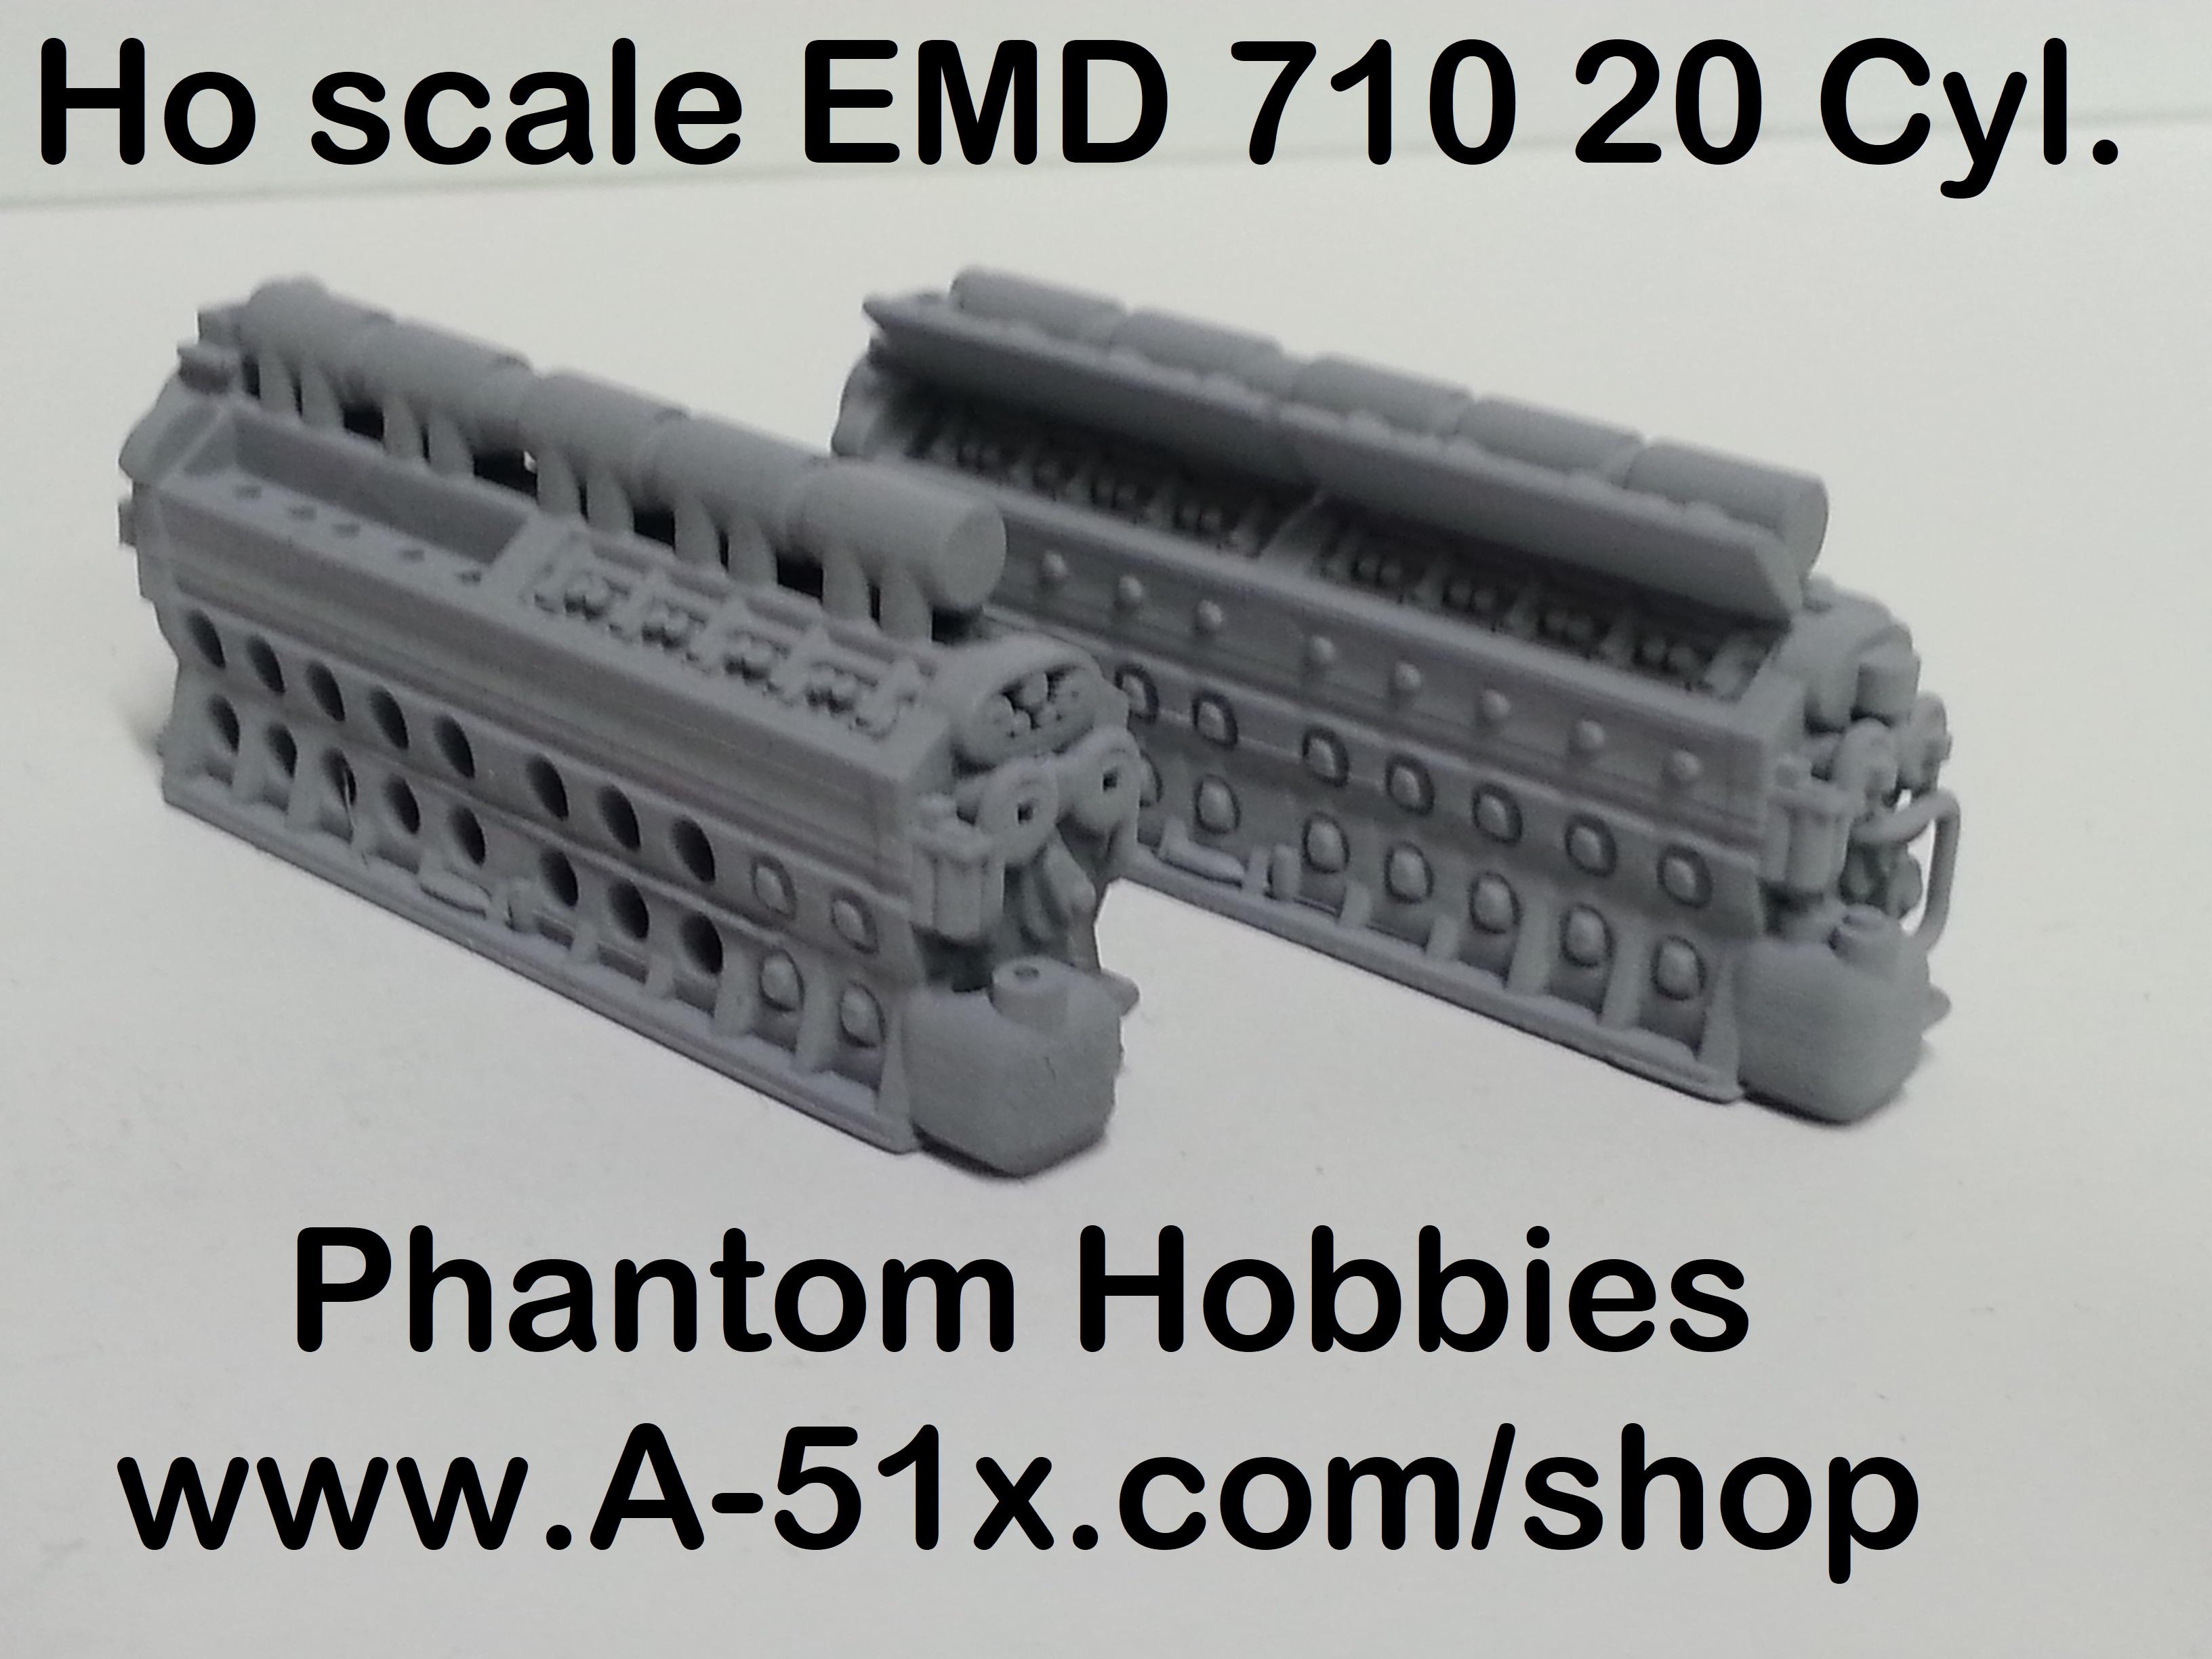 Ho scale EMD 710 20 Cyl.